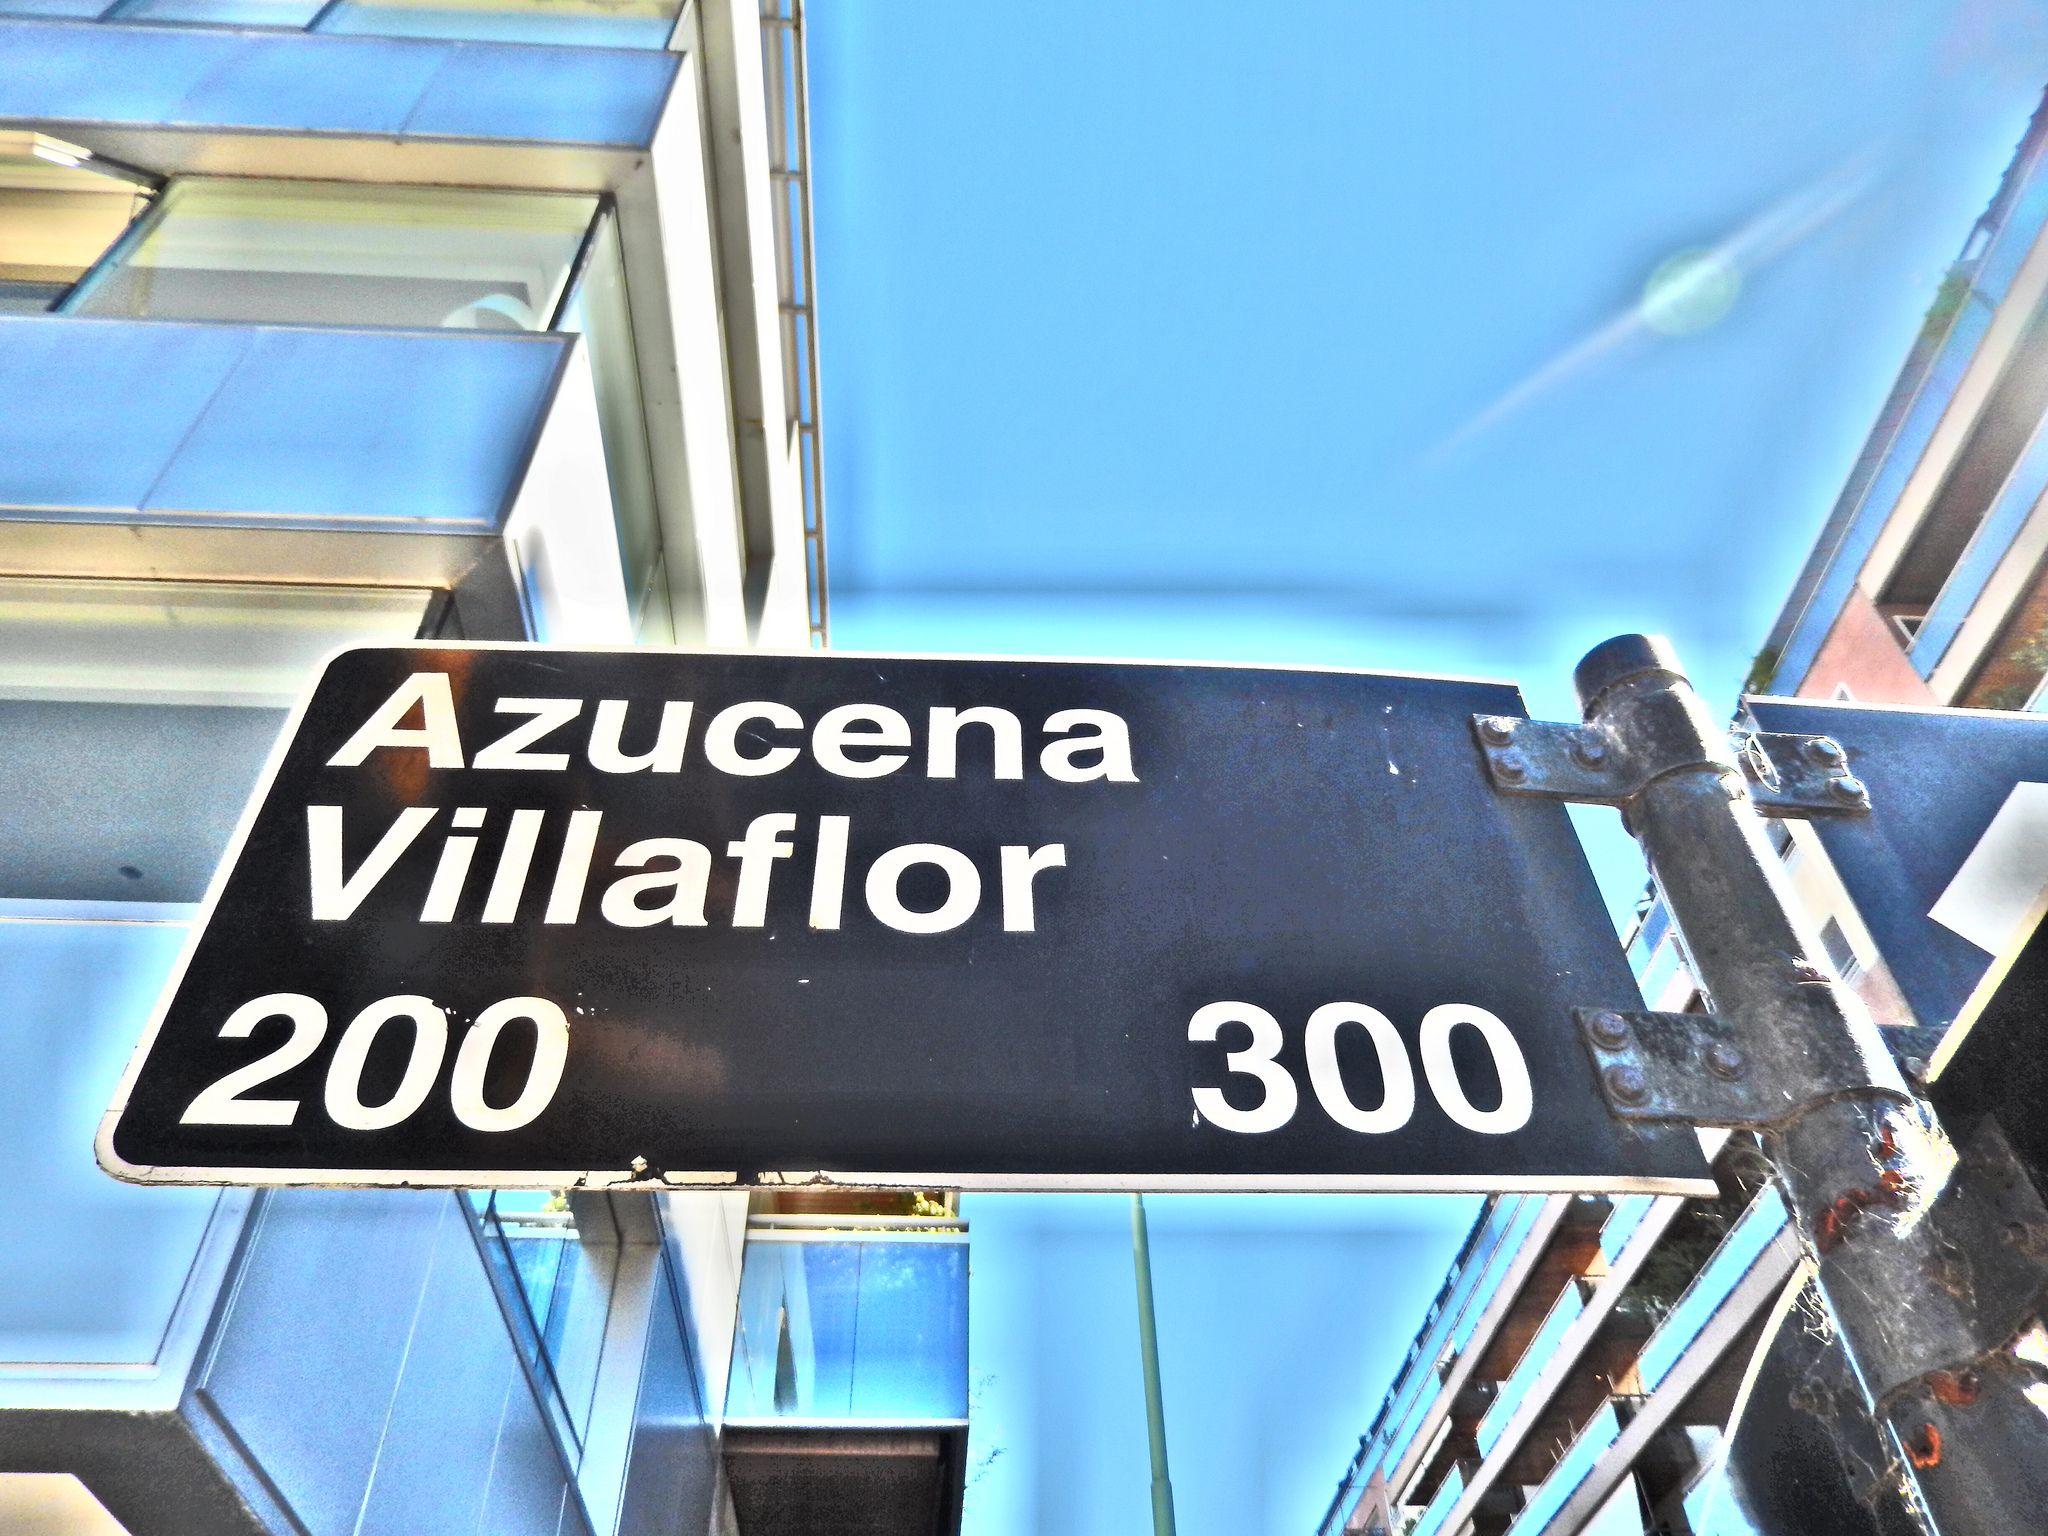 https://flic.kr/s/aHsjMMzp4w | Calle Azucena Villaflor , Puerto Madero | Calle Azucena Villaflor , Puerto Madero